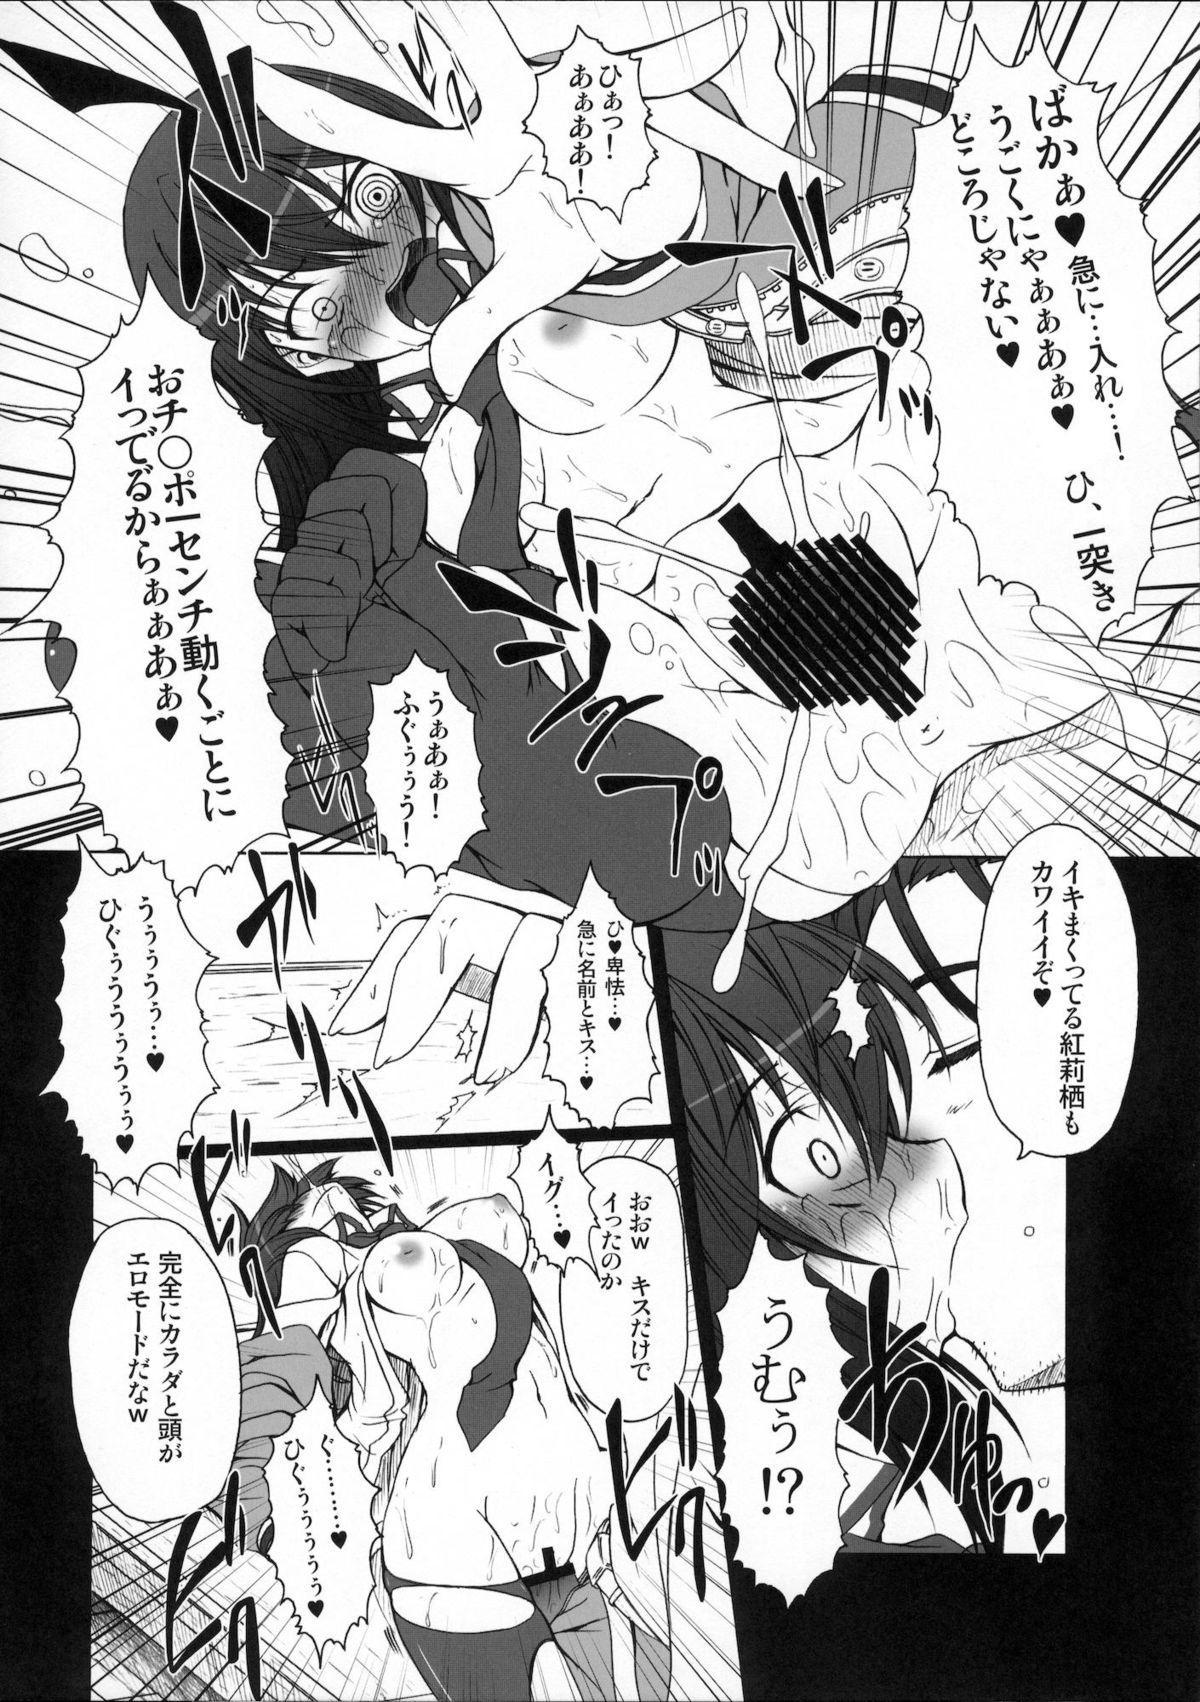 HOBBY'S BLOCK!! 14 Kairaku Tousaku no Ecstasy 22